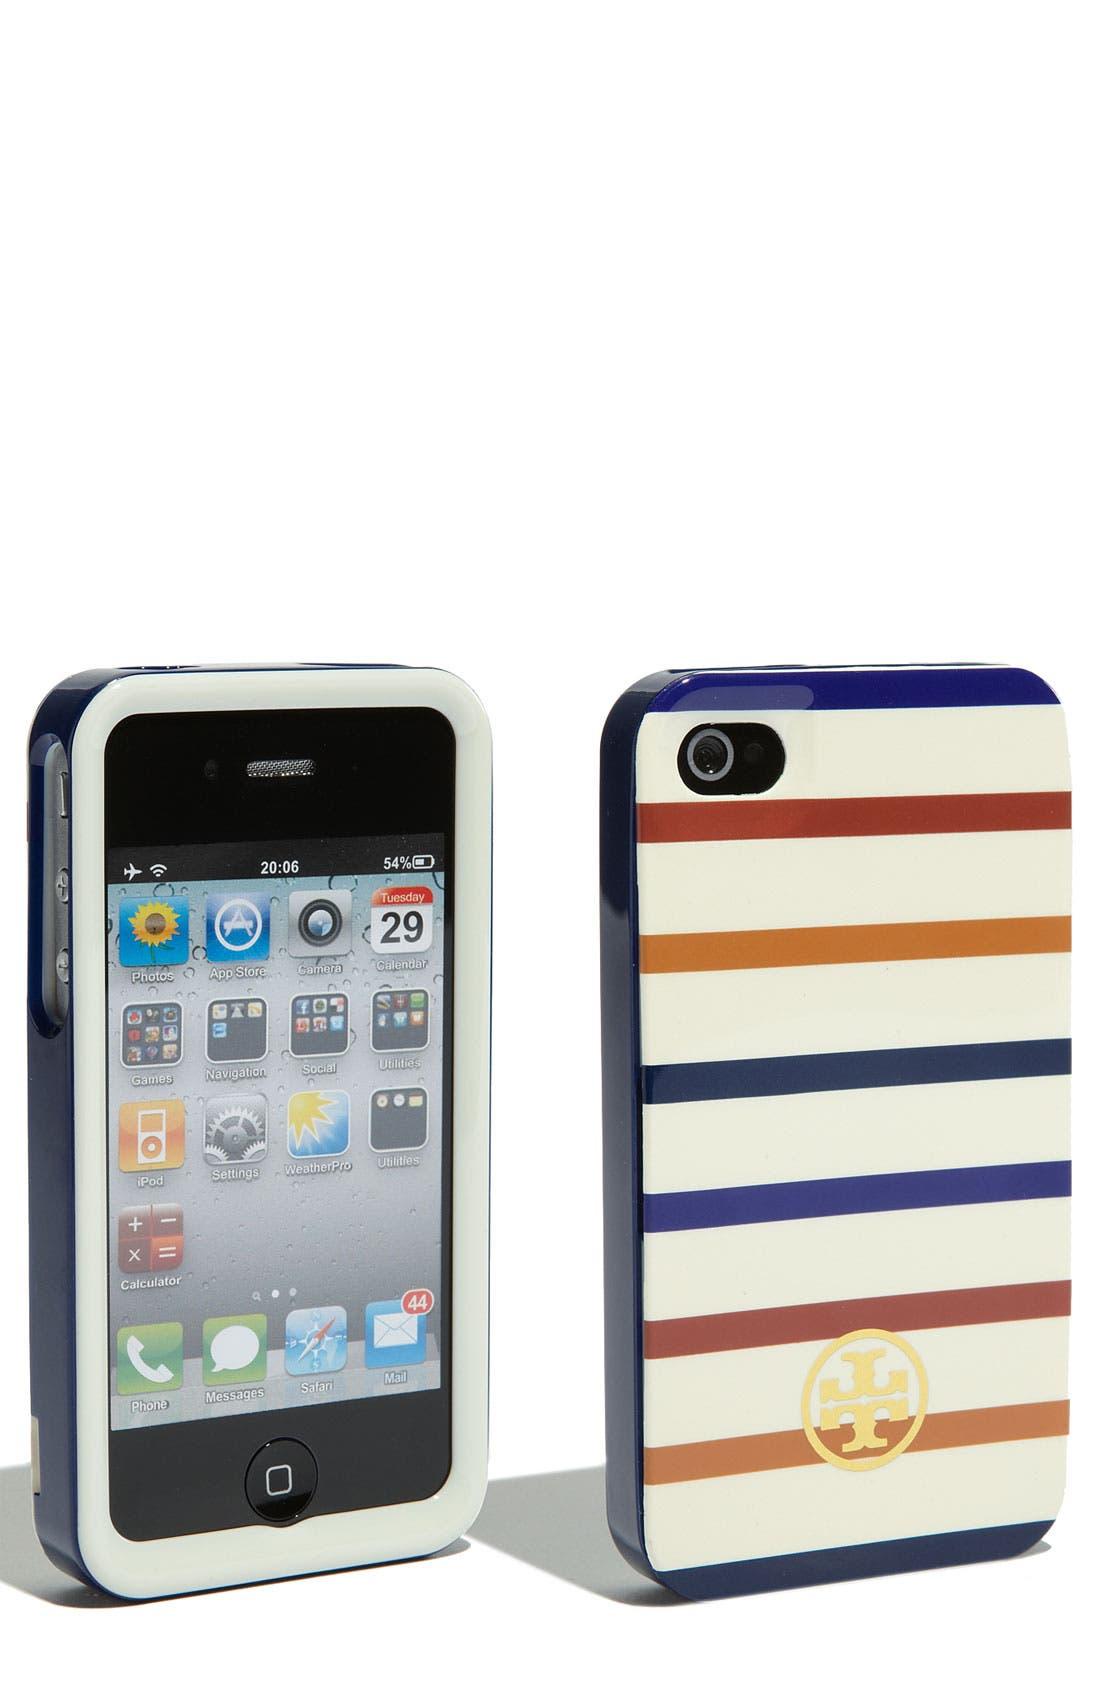 Main Image - Tory Burch iPhone 4 Case